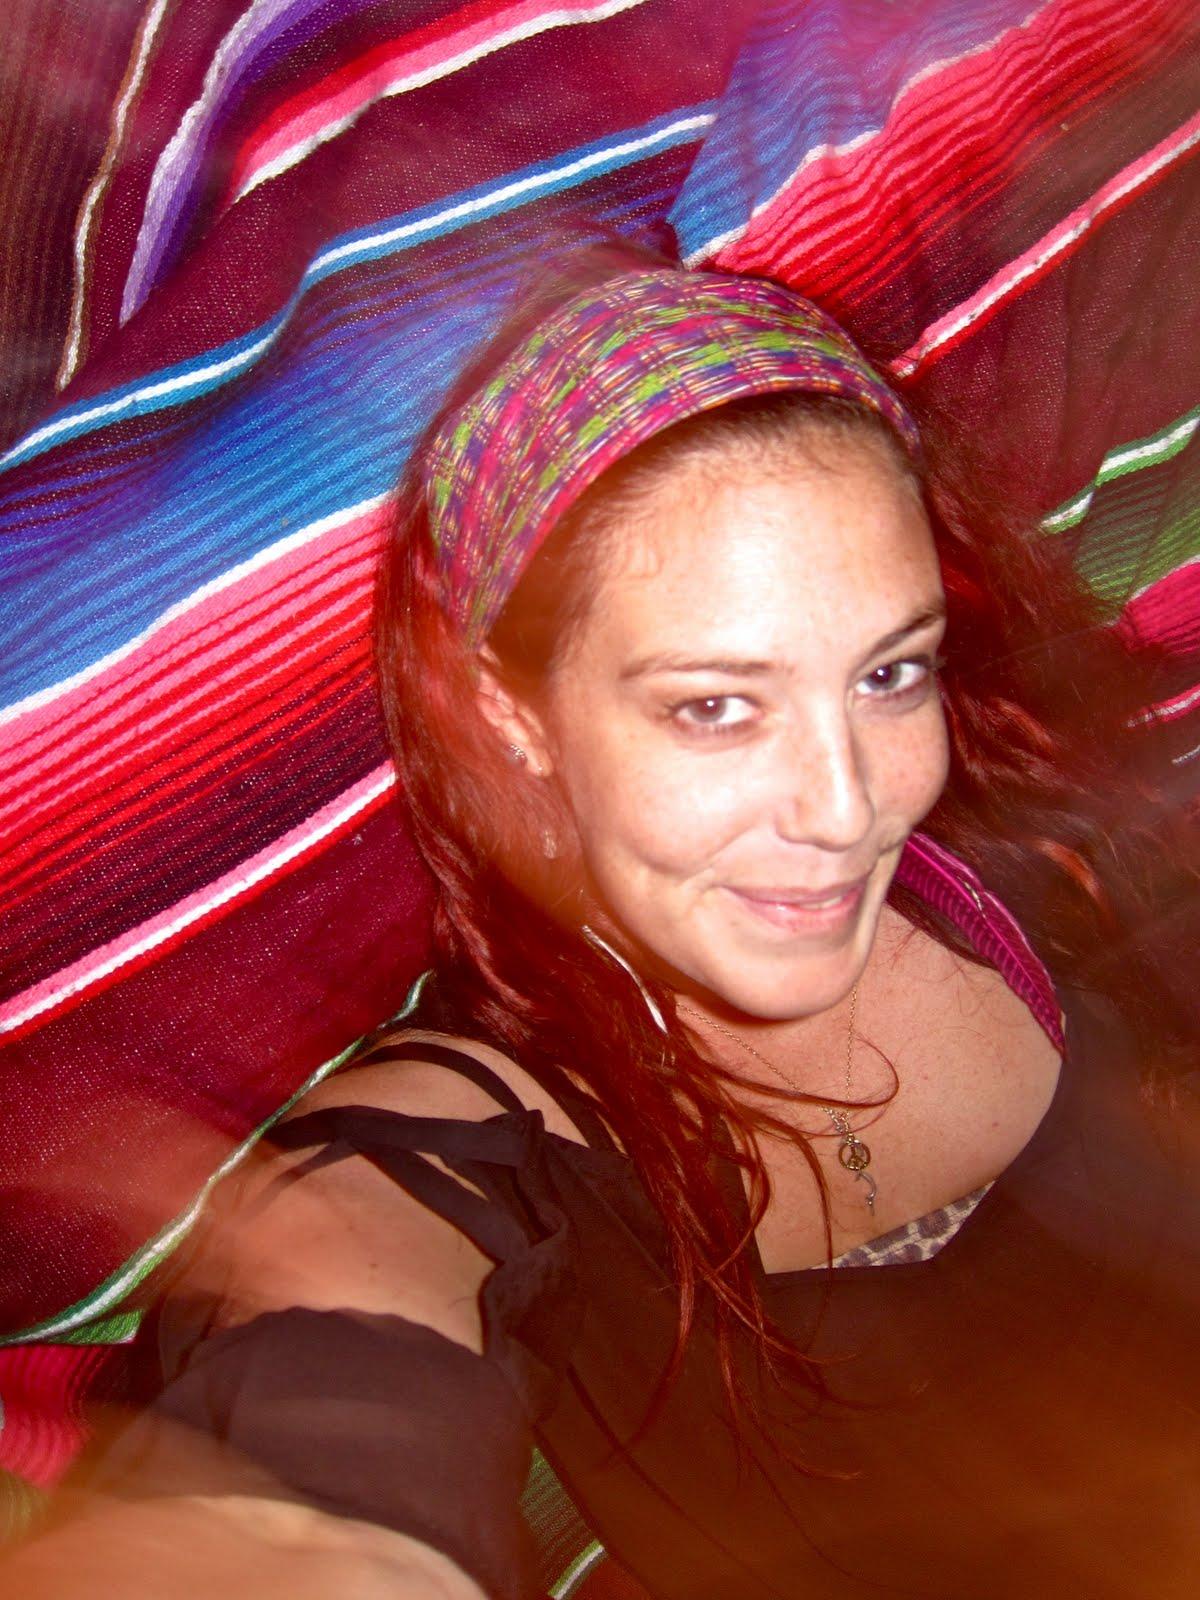 http://2.bp.blogspot.com/-Yy7ajecmNW4/TixBJCRePUI/AAAAAAAAAik/yWQMSI8oBkc/s1600/IMG_3764.JPG